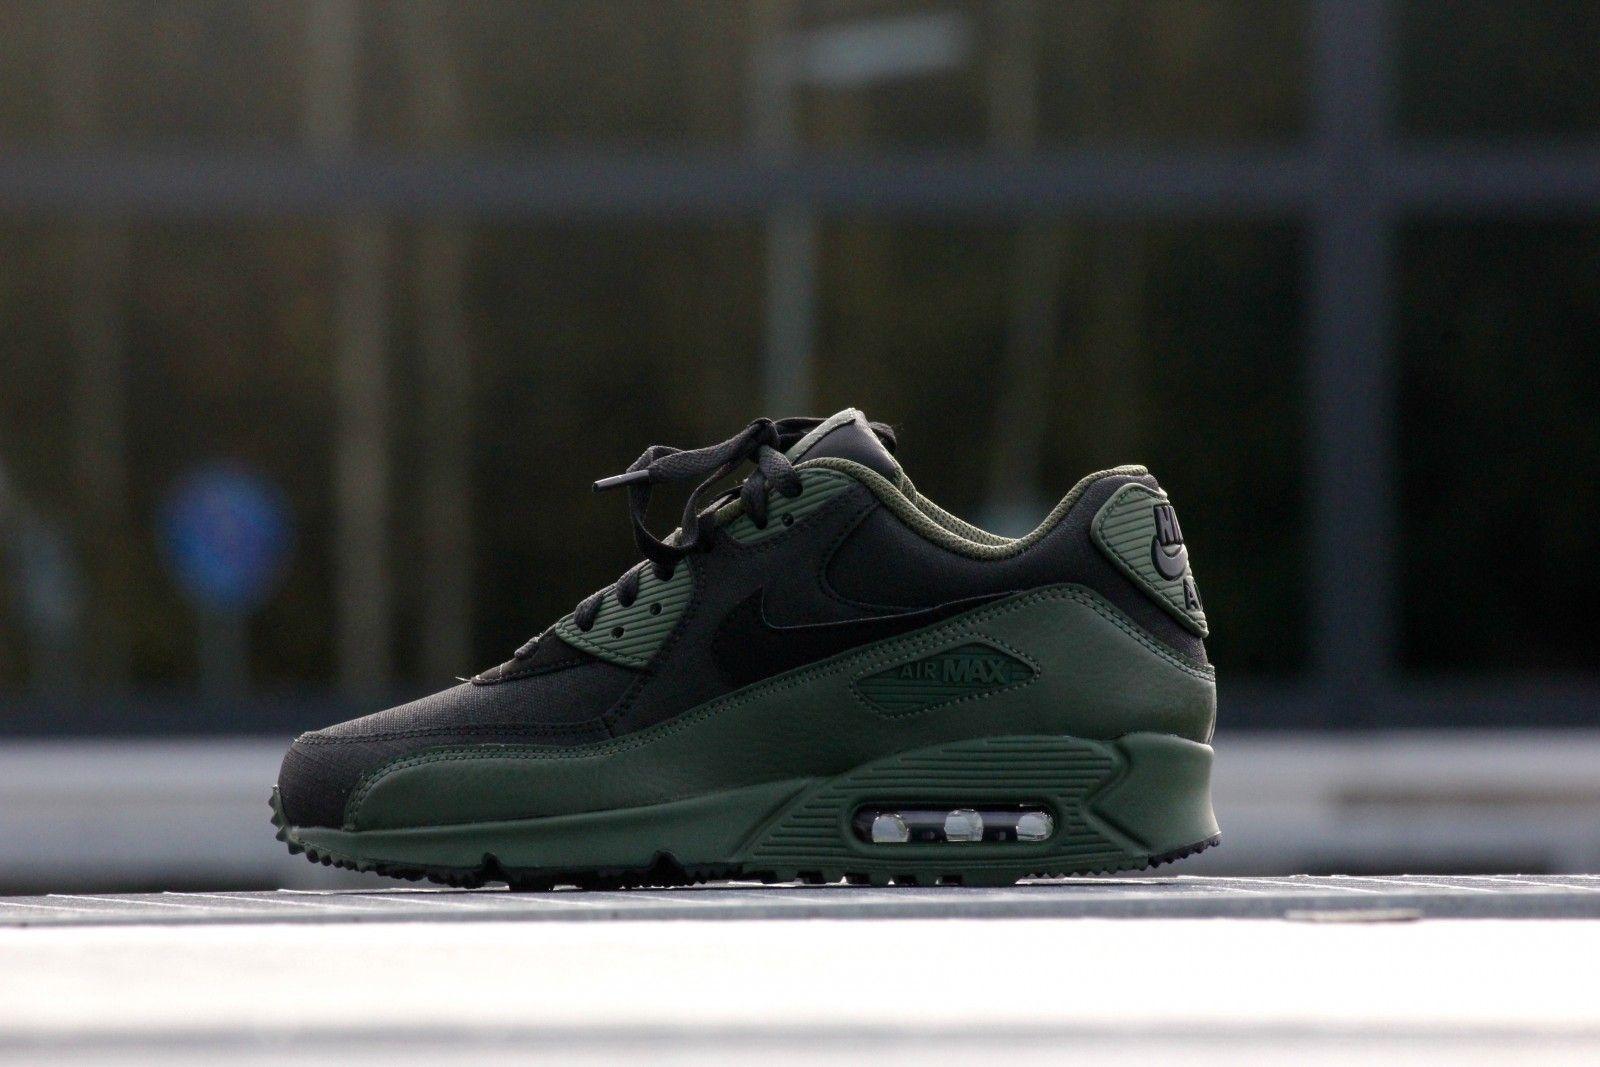 Nike Air Max 90 Winter Premium Carbon Vert 683282 303 Baskets